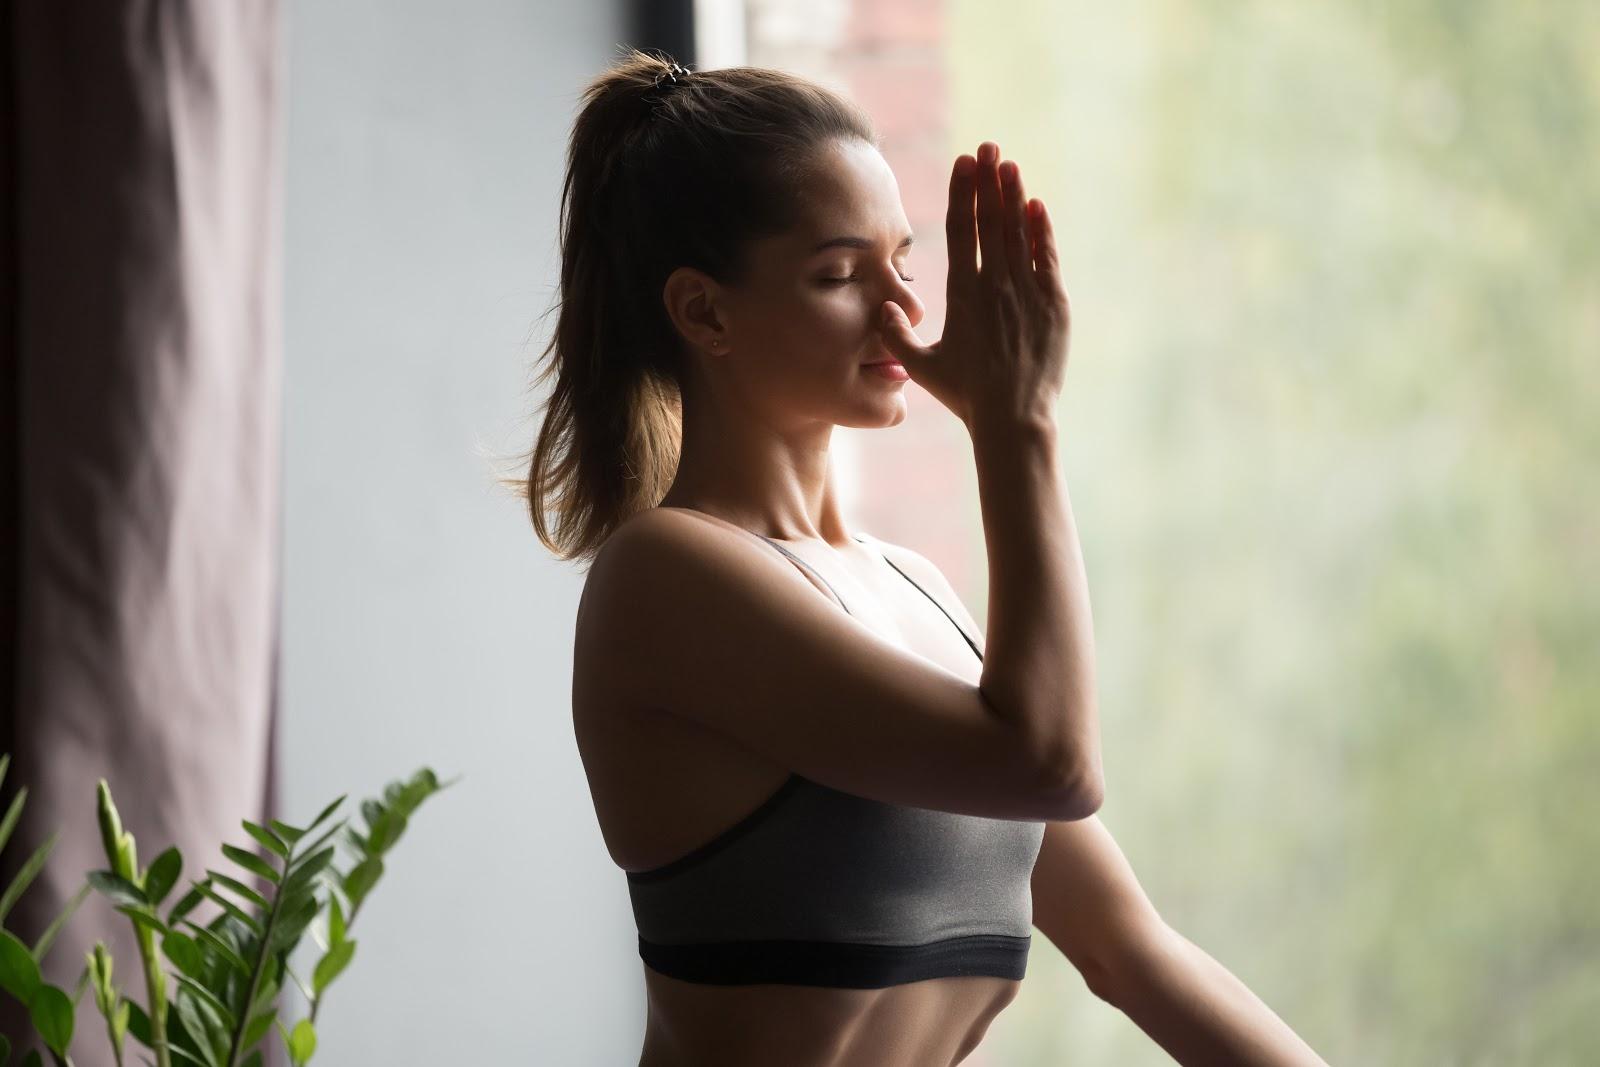 mulher meditando concentrada